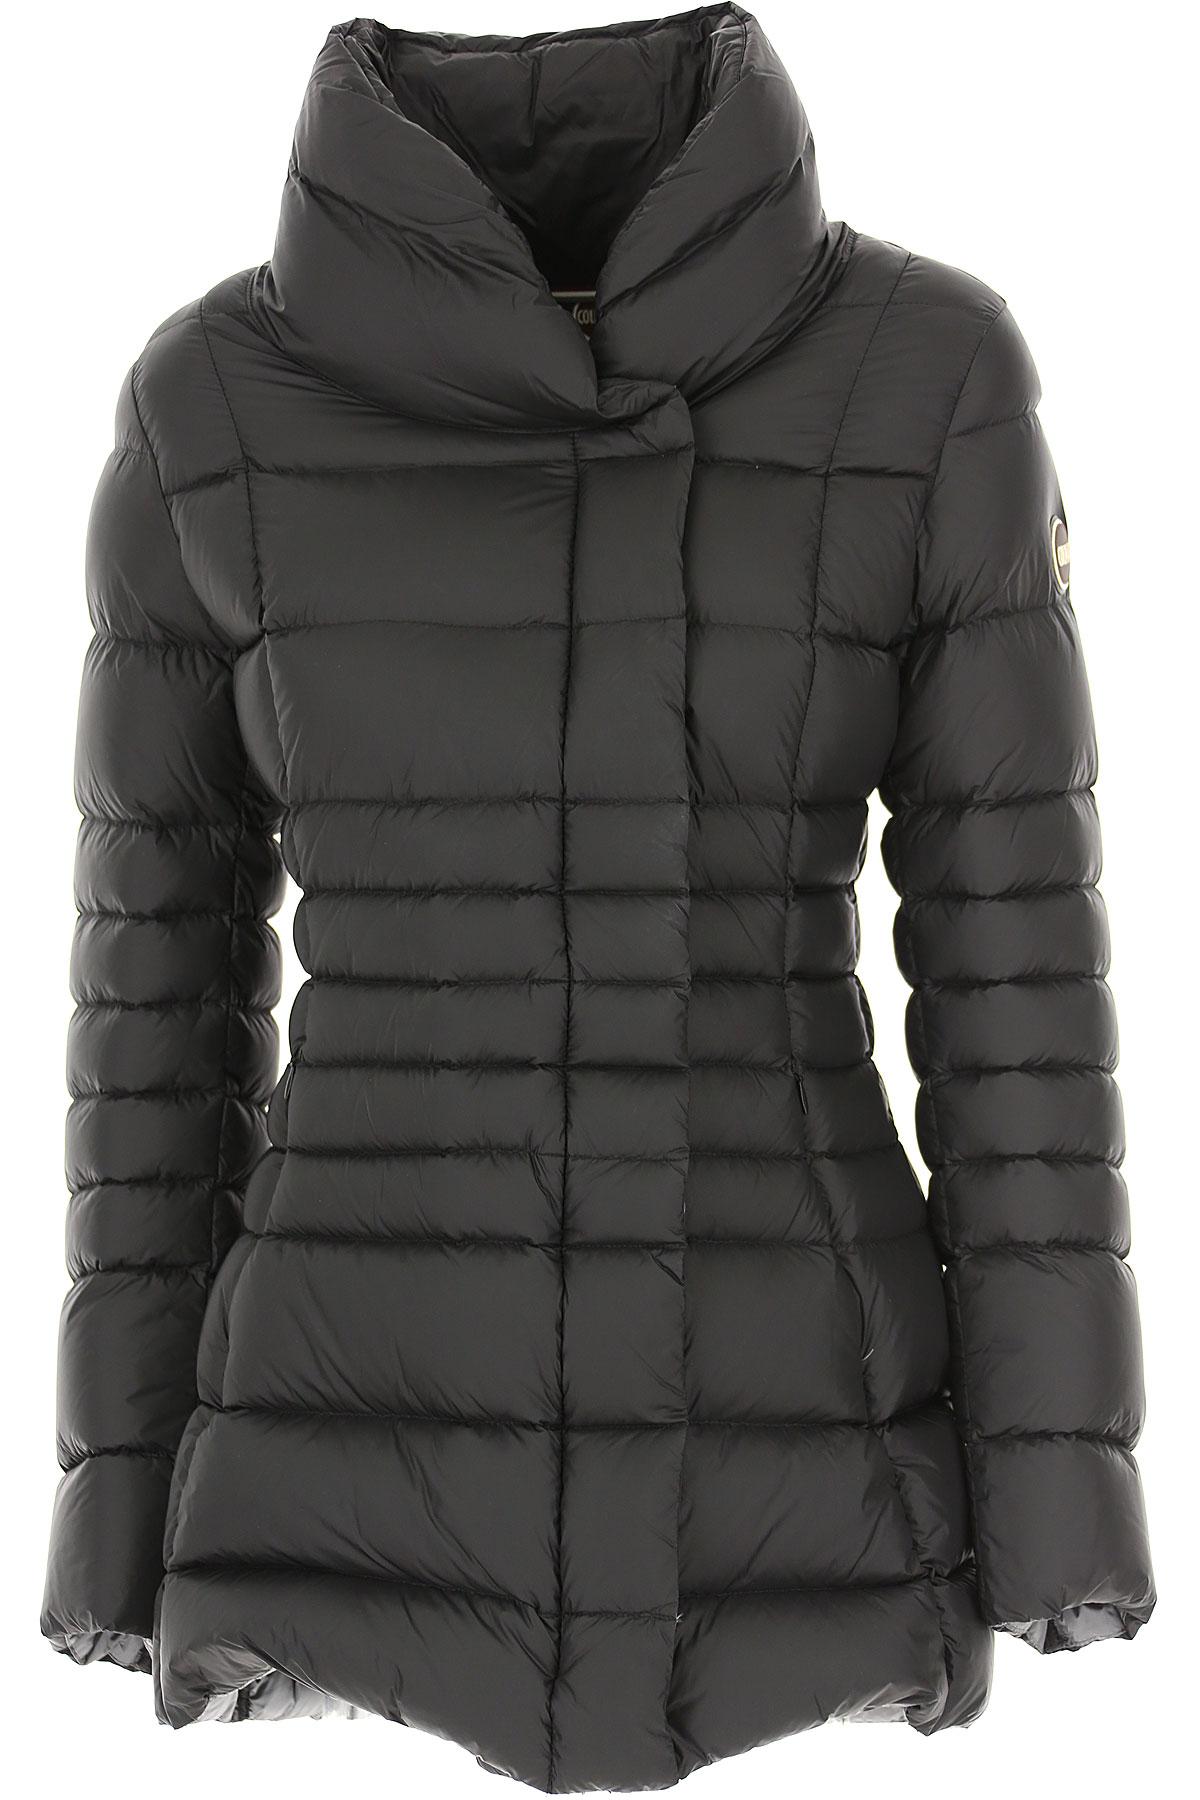 Womens Clothing Colmar, Style code: 2271 7qd 99